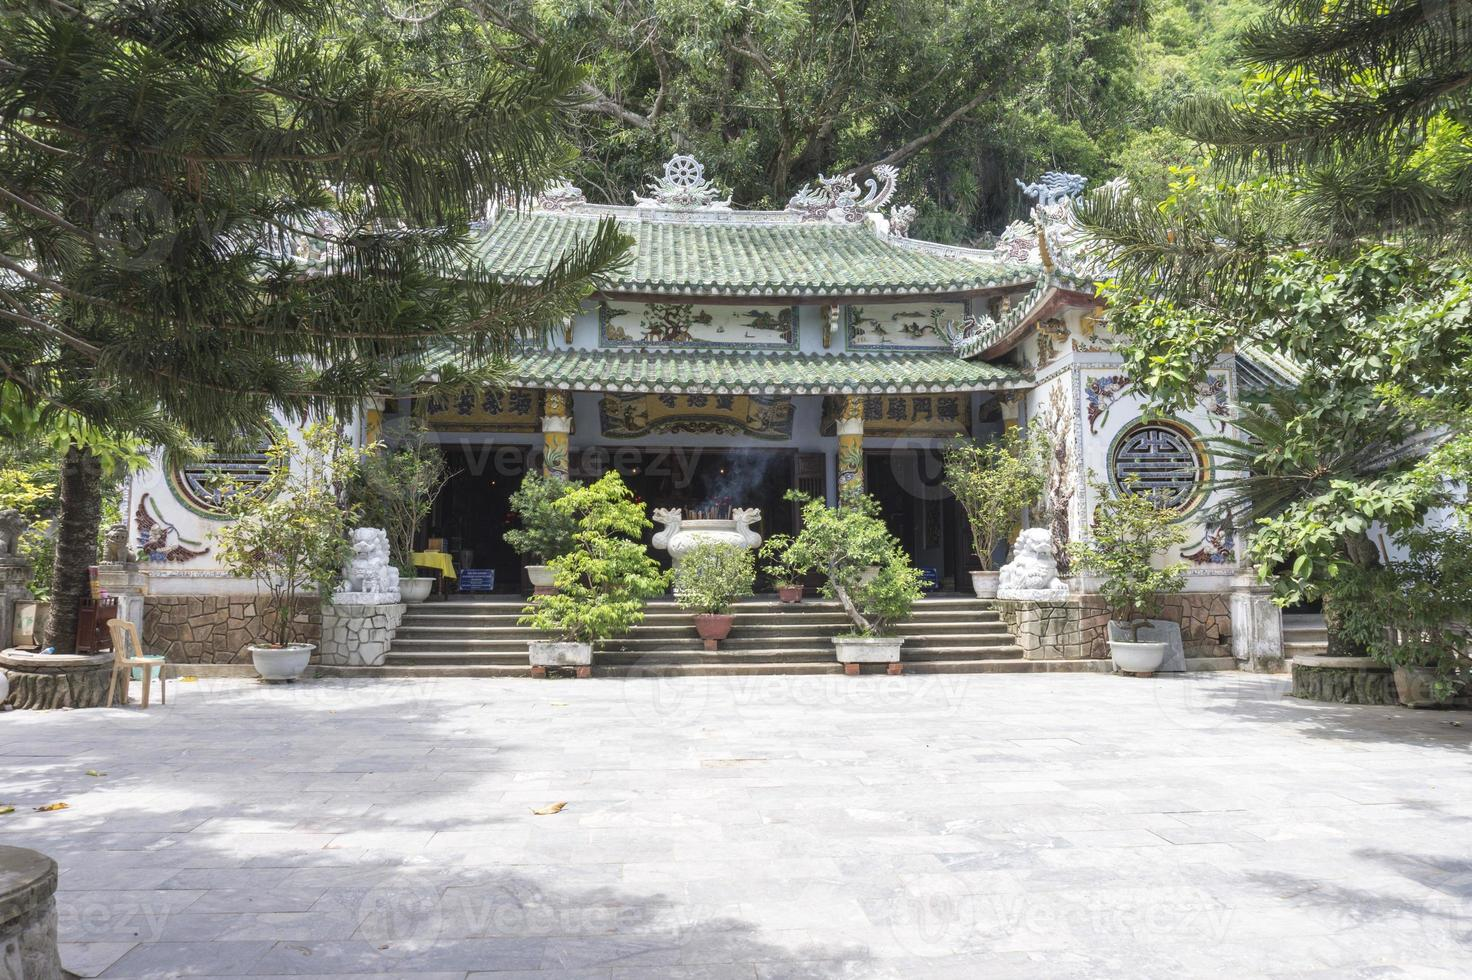 Antique pagoda photo